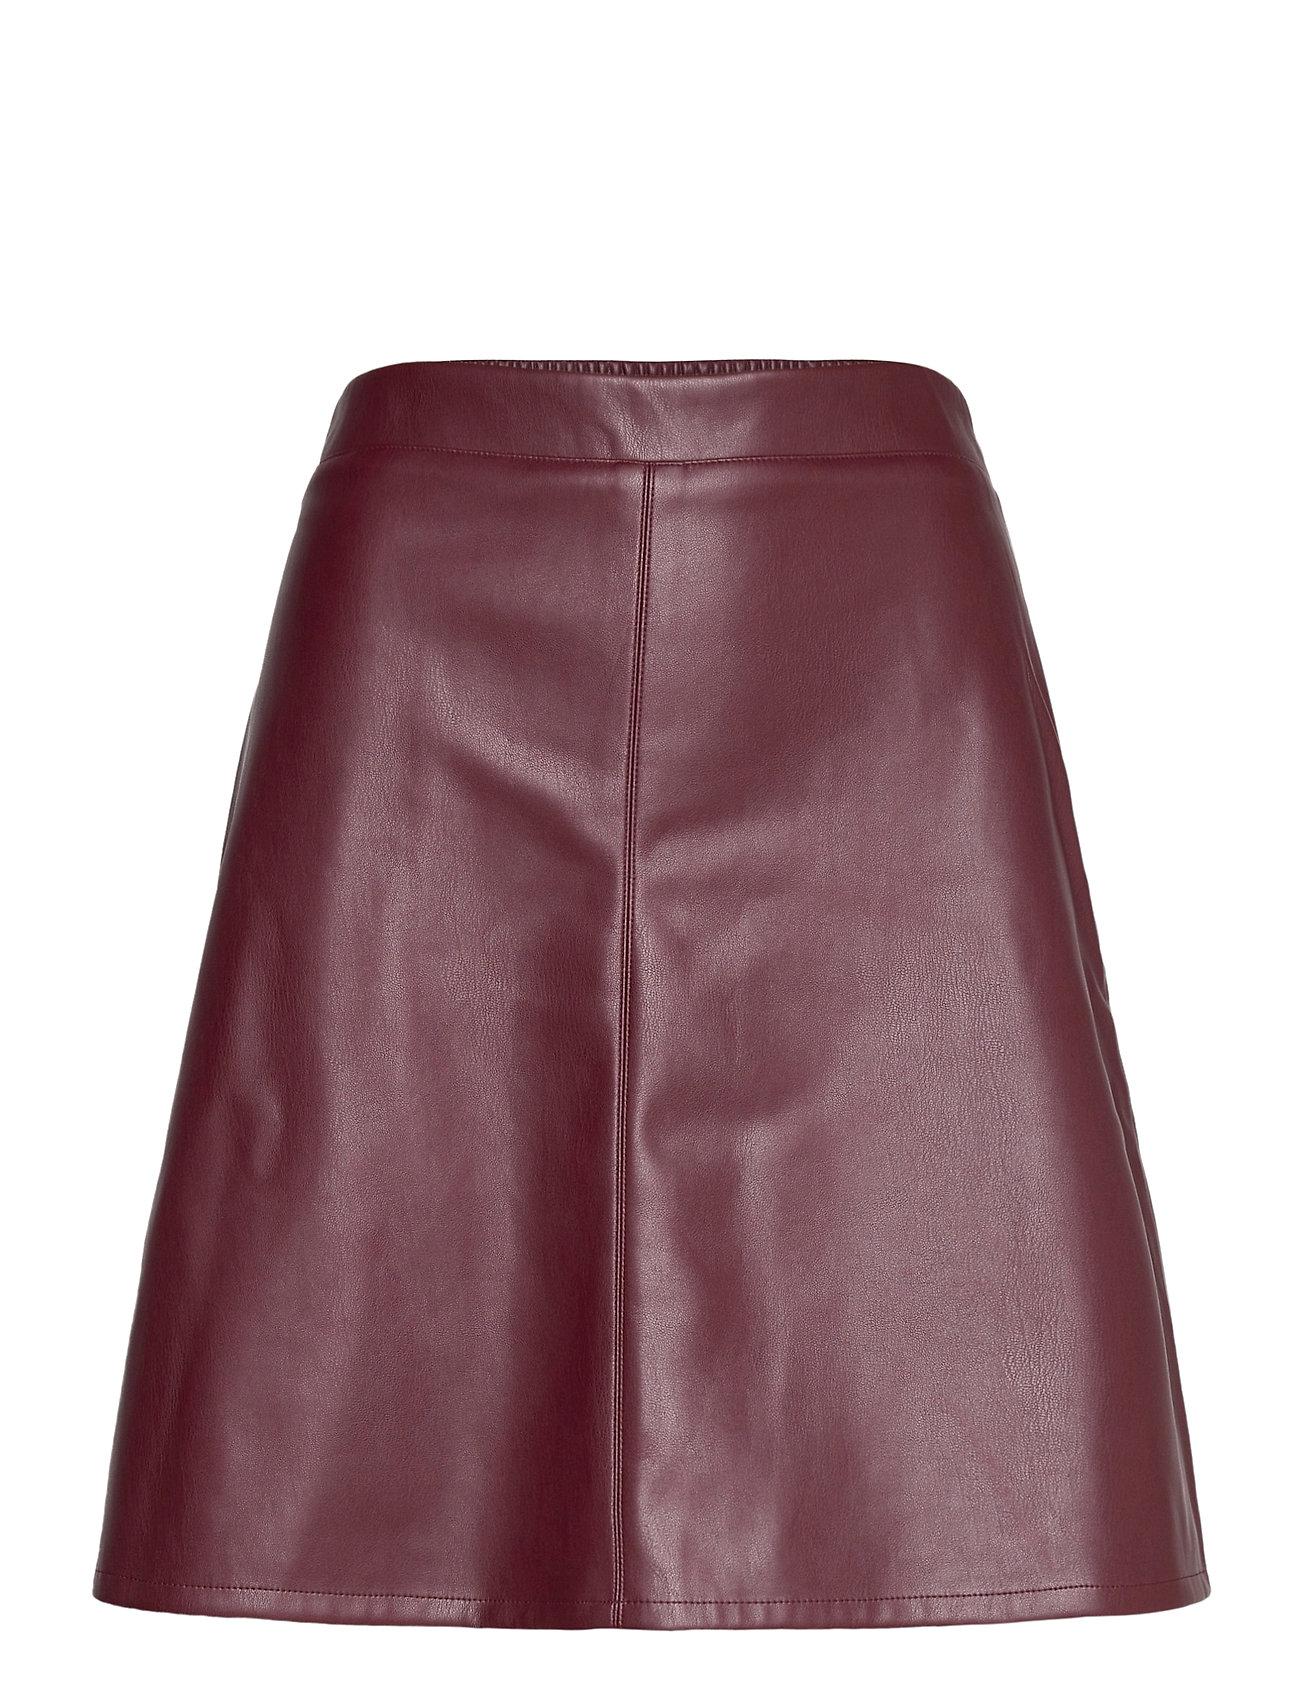 Image of Skirts Woven Kort Nederdel Rød Esprit Casual (3466696183)